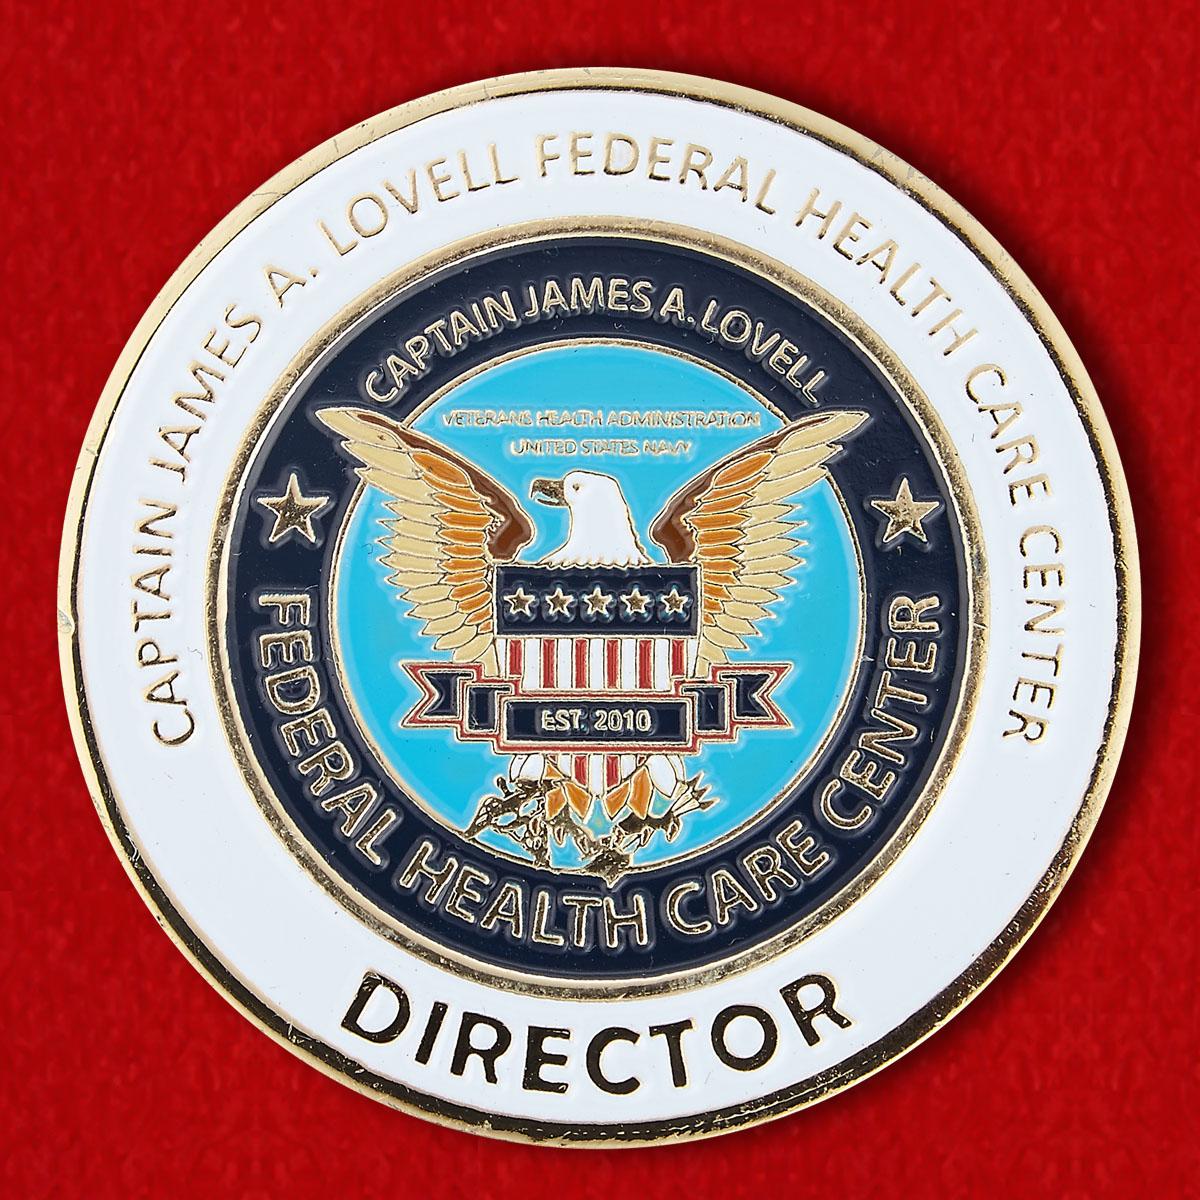 Челледж коин Федерального Центра Здравоохранения имени капитана Джеймса А. Ловелла